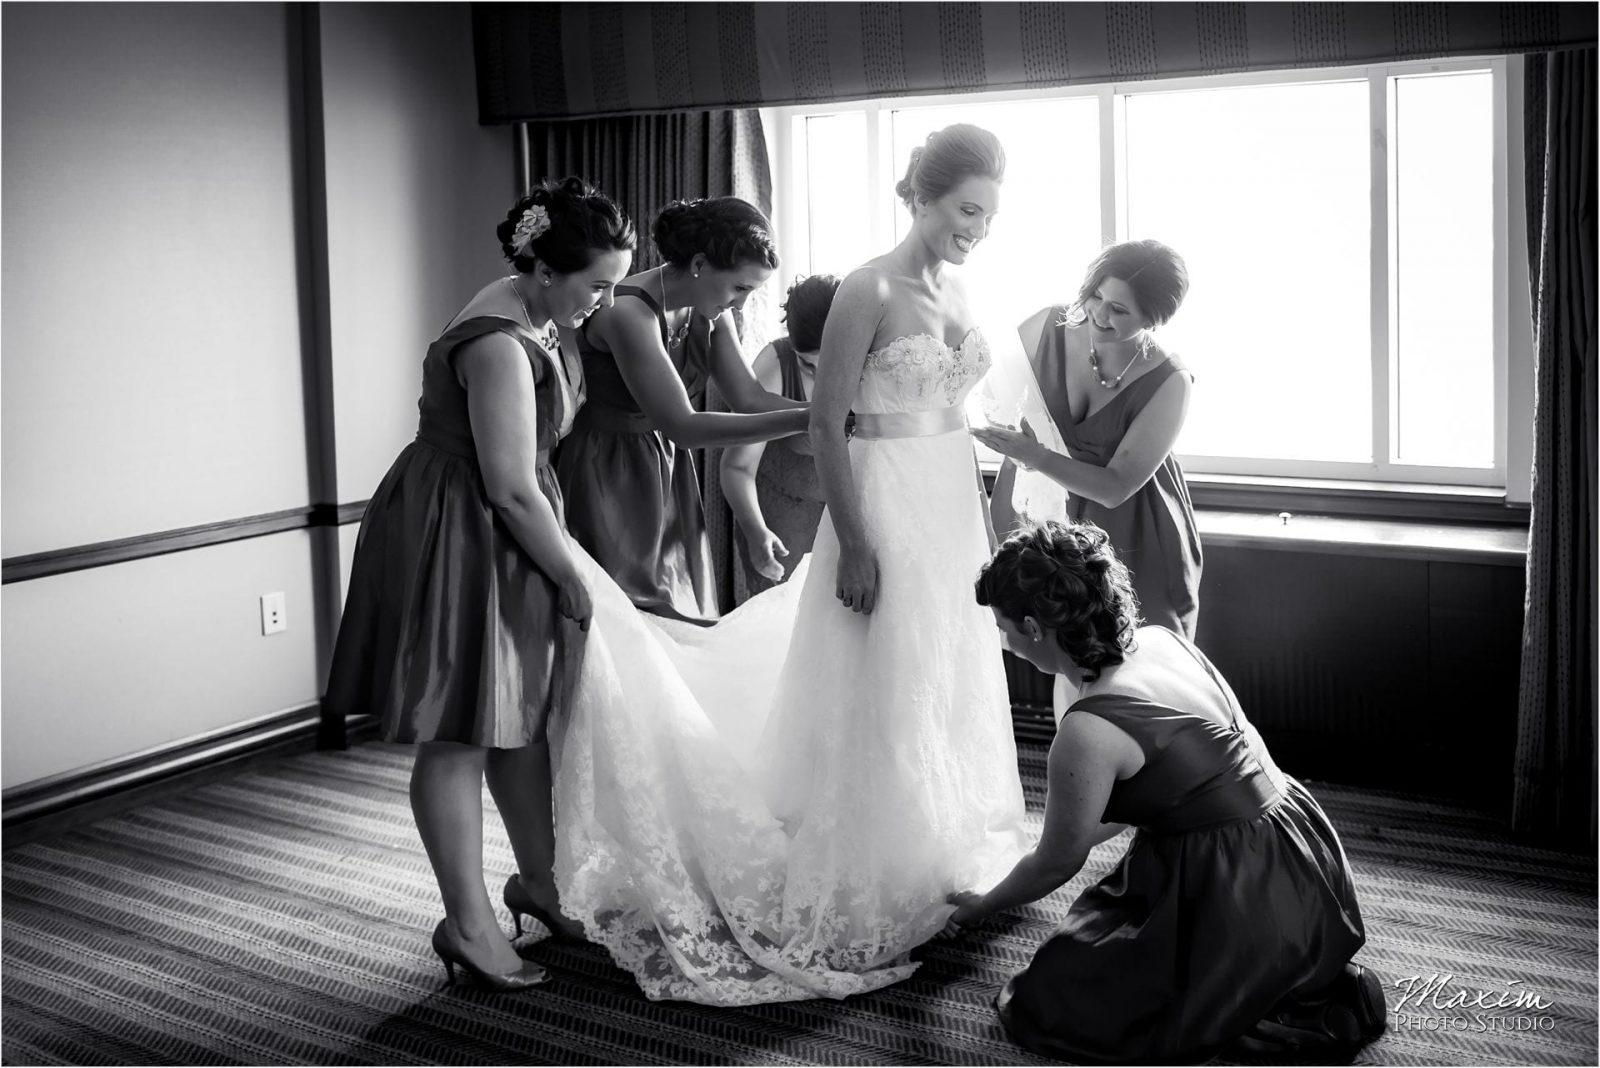 Marriott Rivercenter Covington, Cincinnati Wedding, Bride preparations, bridesmaids